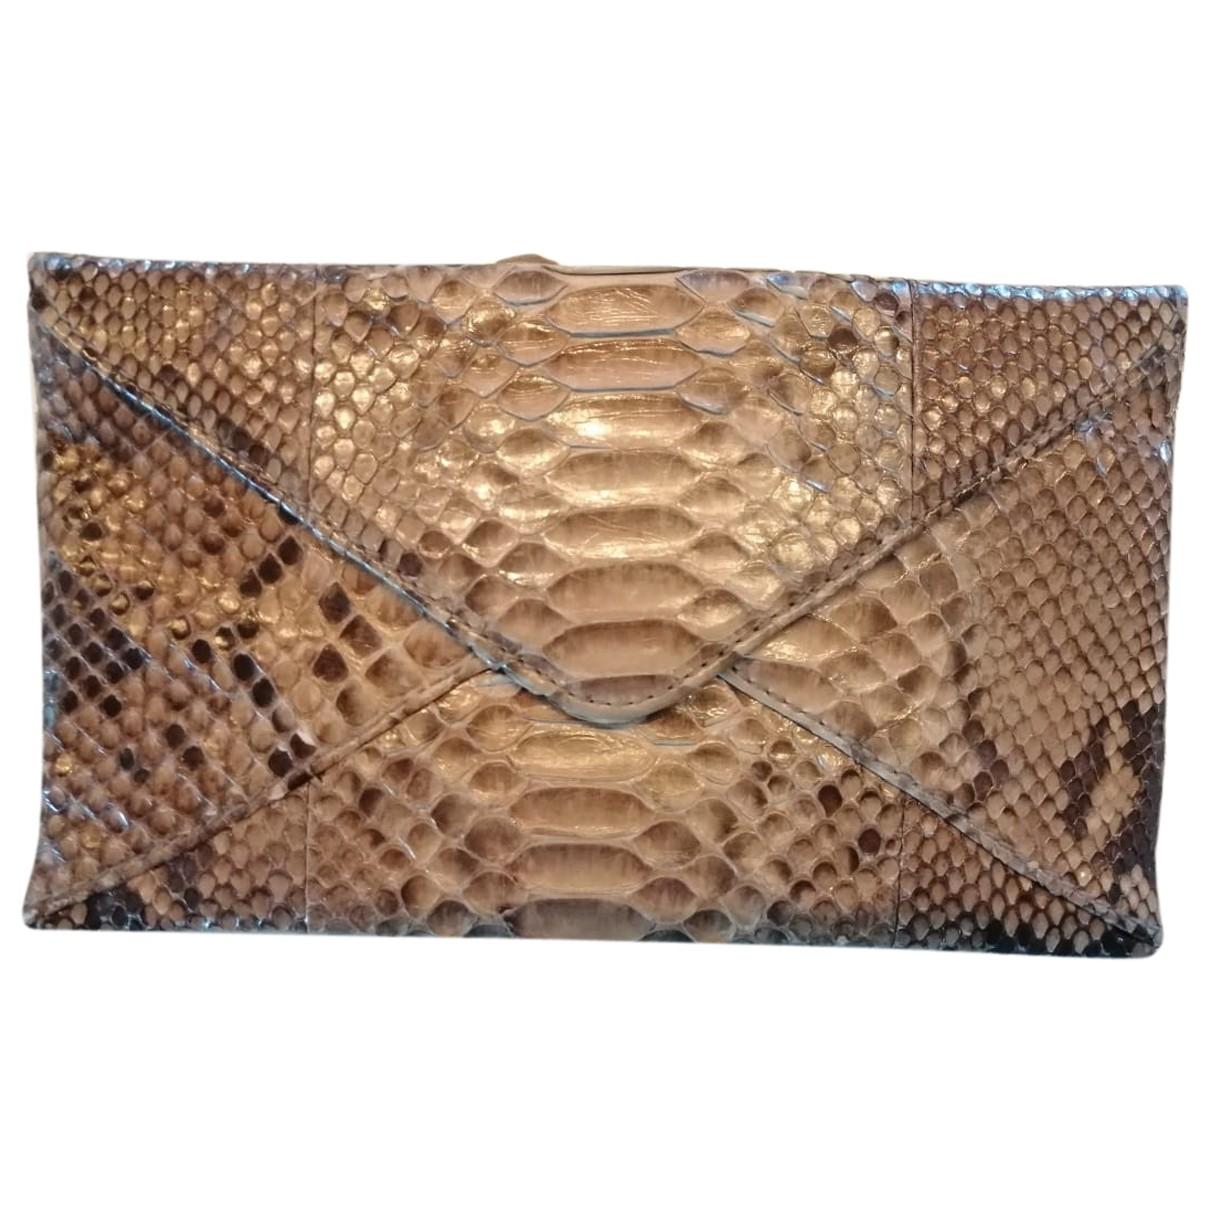 Michael Kors \N Multicolour Exotic leathers Clutch bag for Women \N